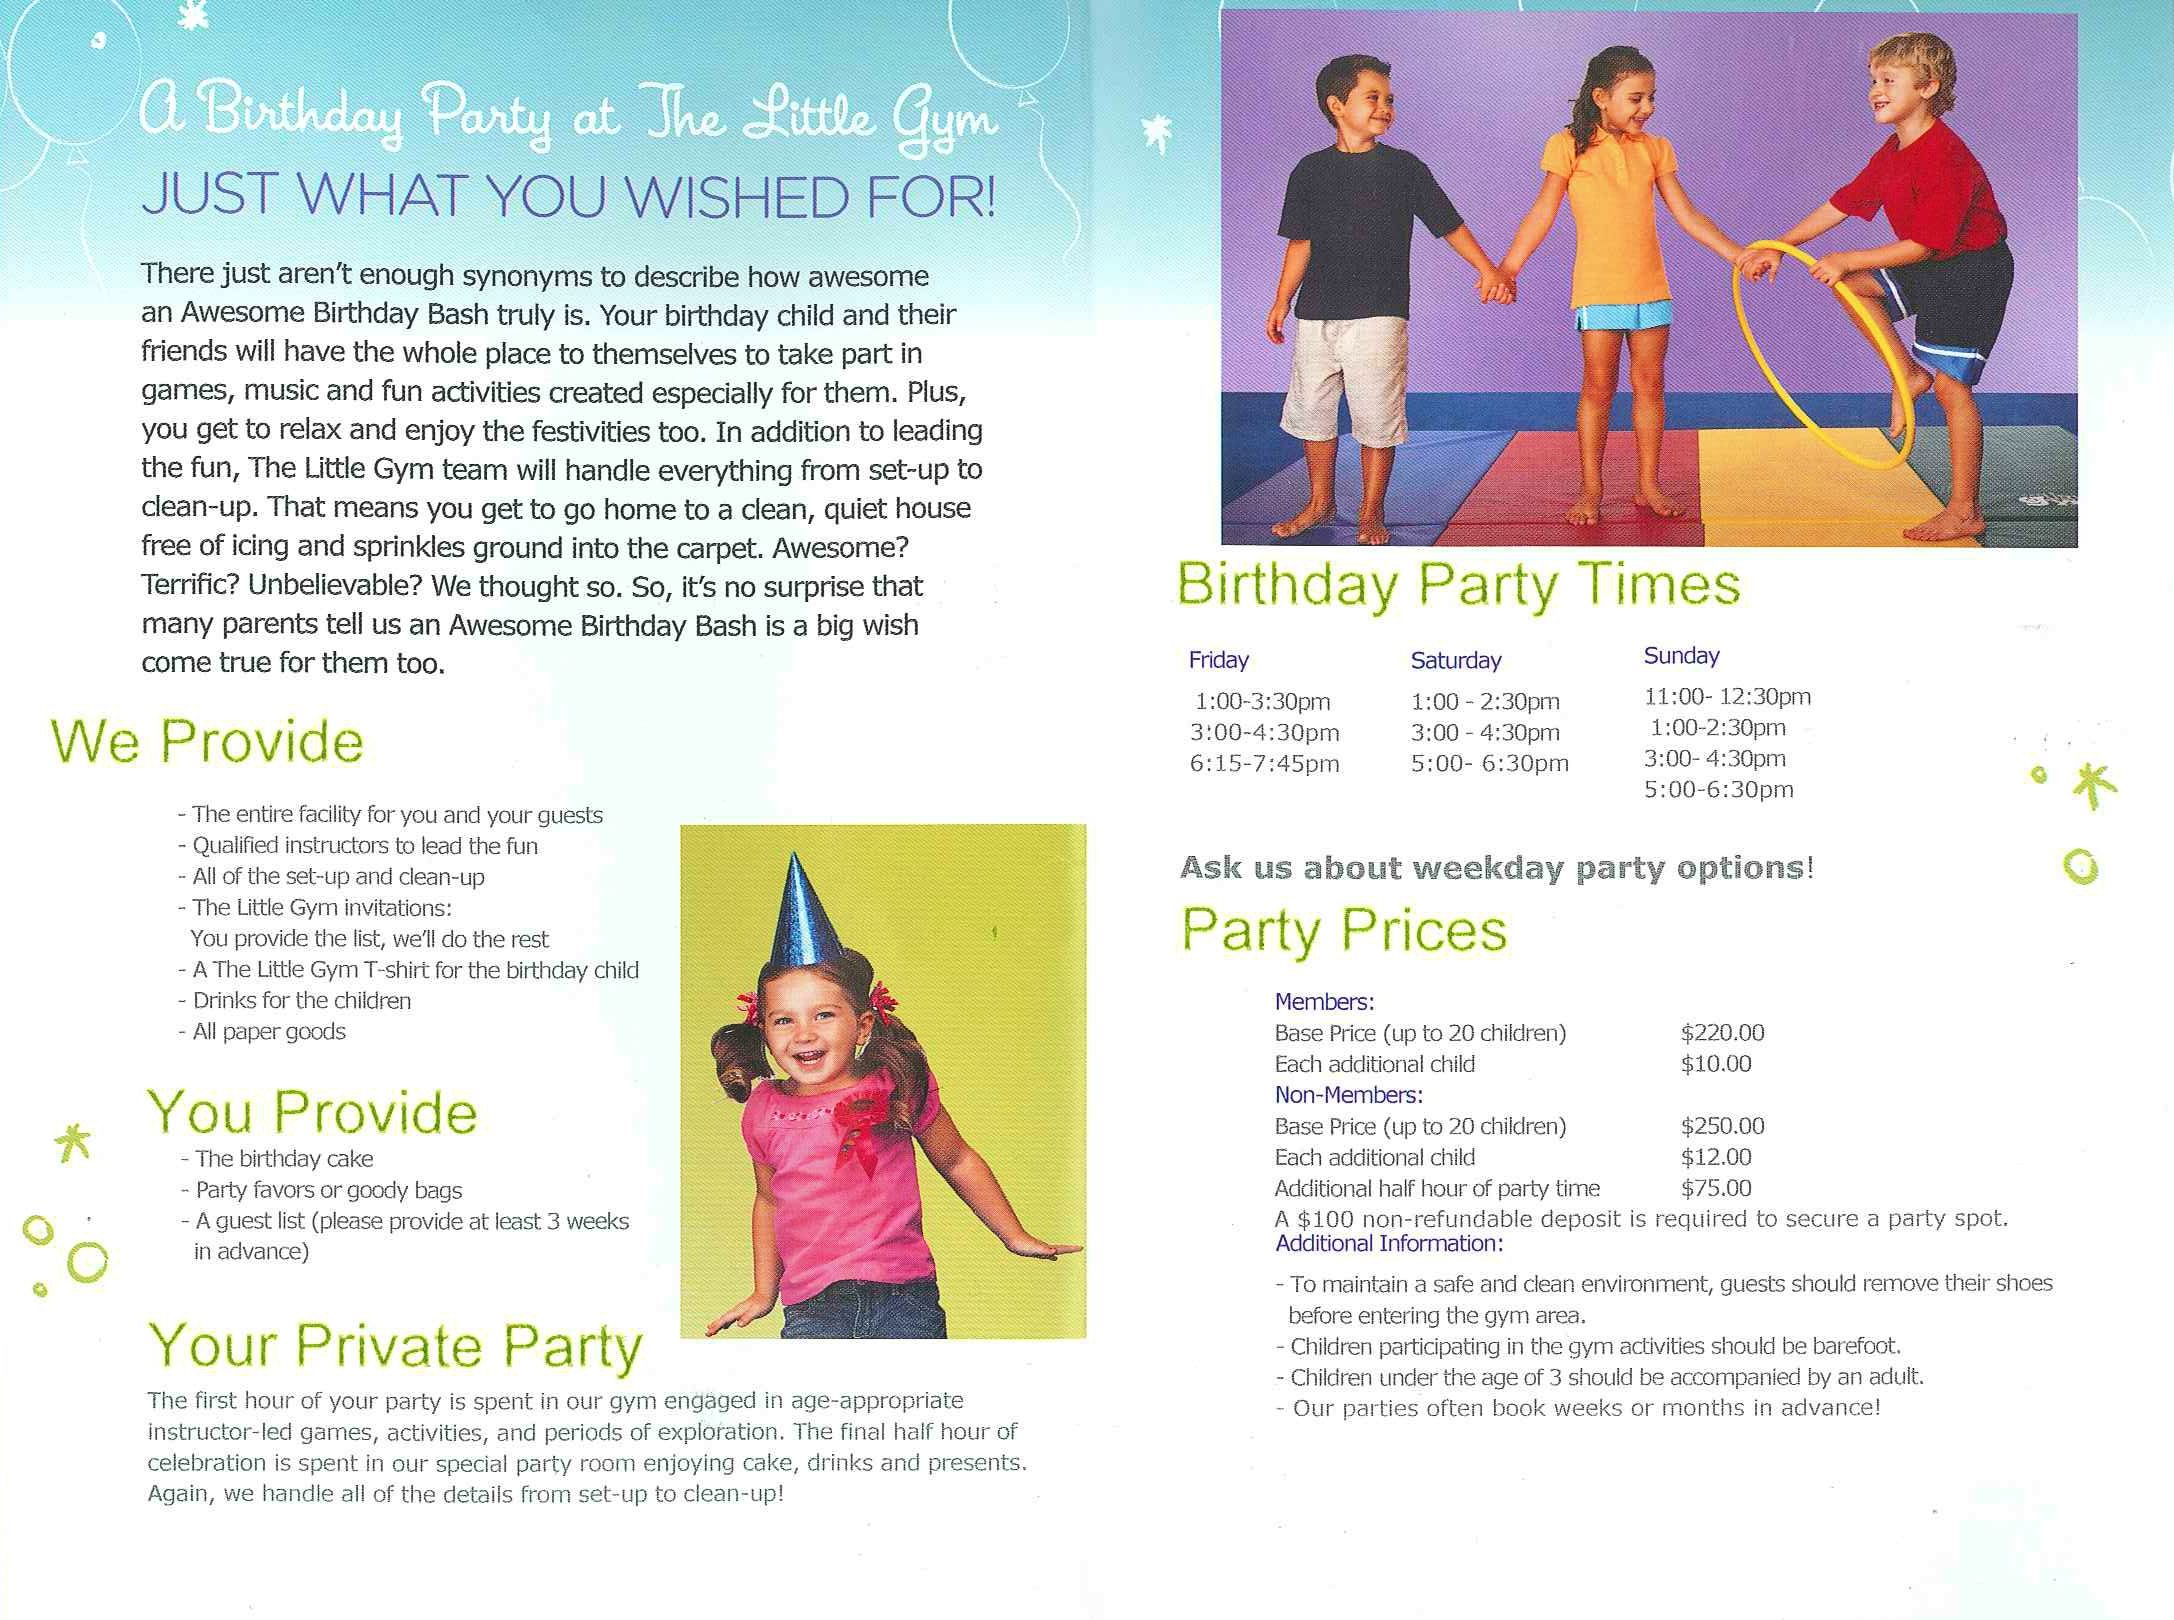 Little Gym 601 856 4854 Renaissance At Colony Park 1000 Highland Colony Parkway Ridgeland Ms 39157 Shoprenai Kids Birthday Fun Activities Kids Birthday Party